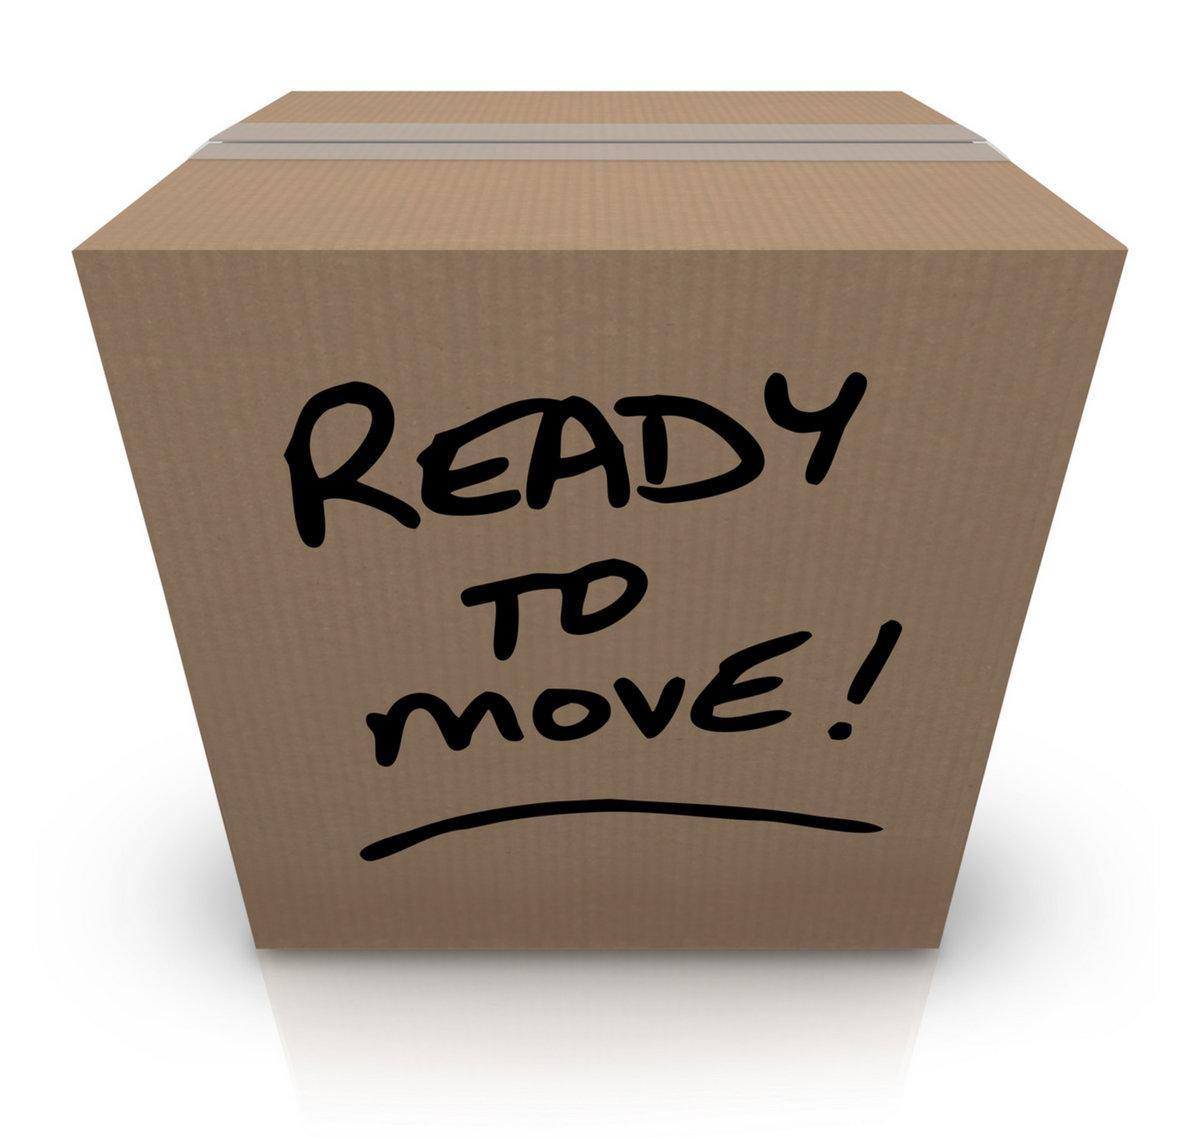 hiring movers off craigslist san antonio | jalen gould